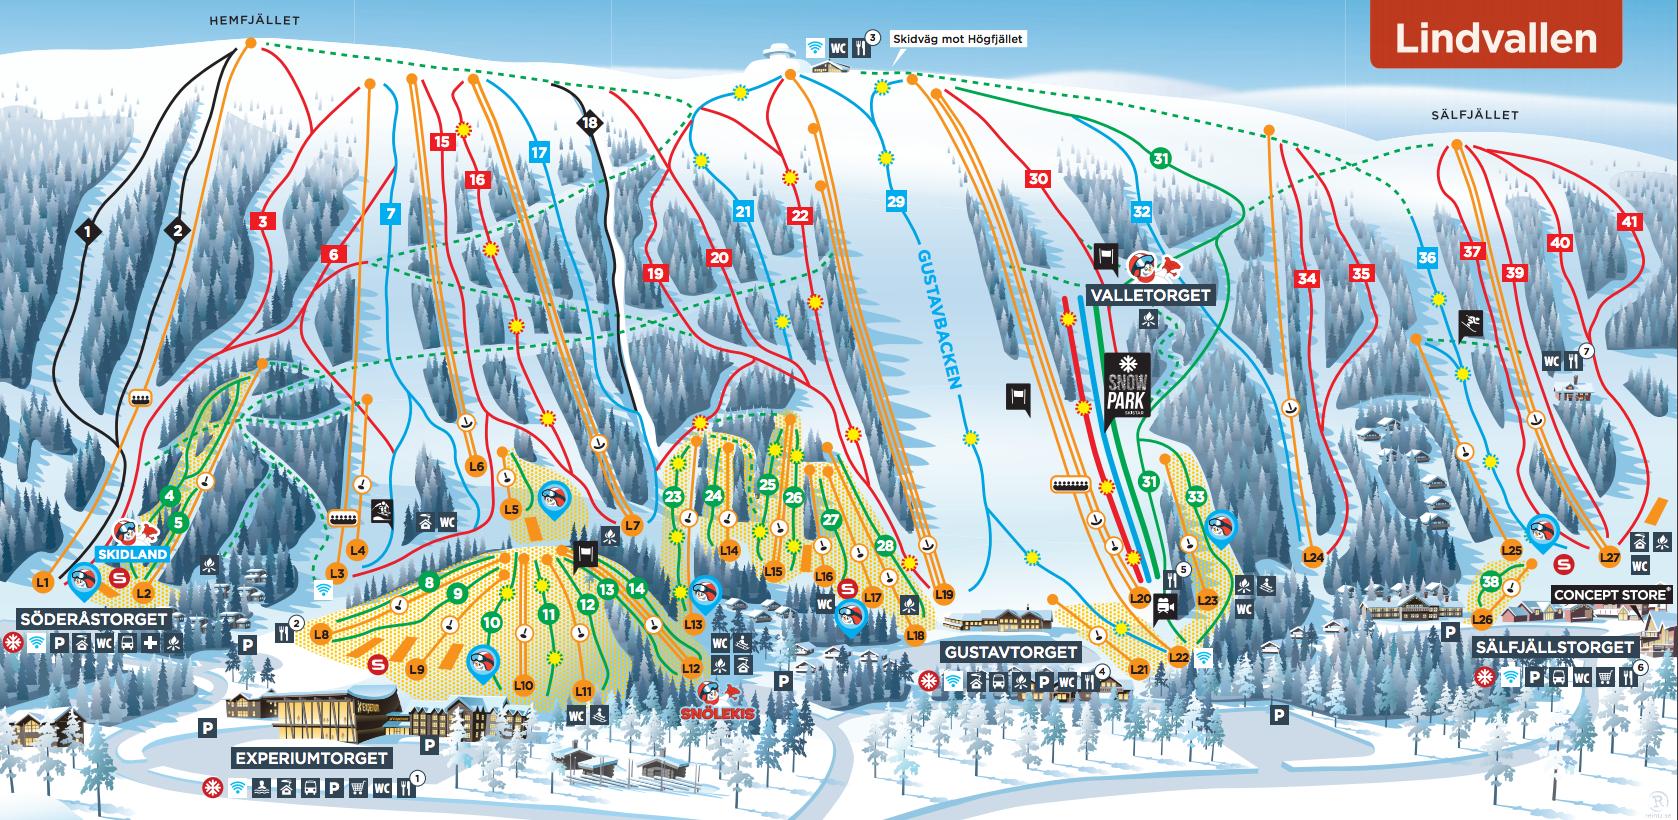 Download Skistars Lindvallens piste map as pdf